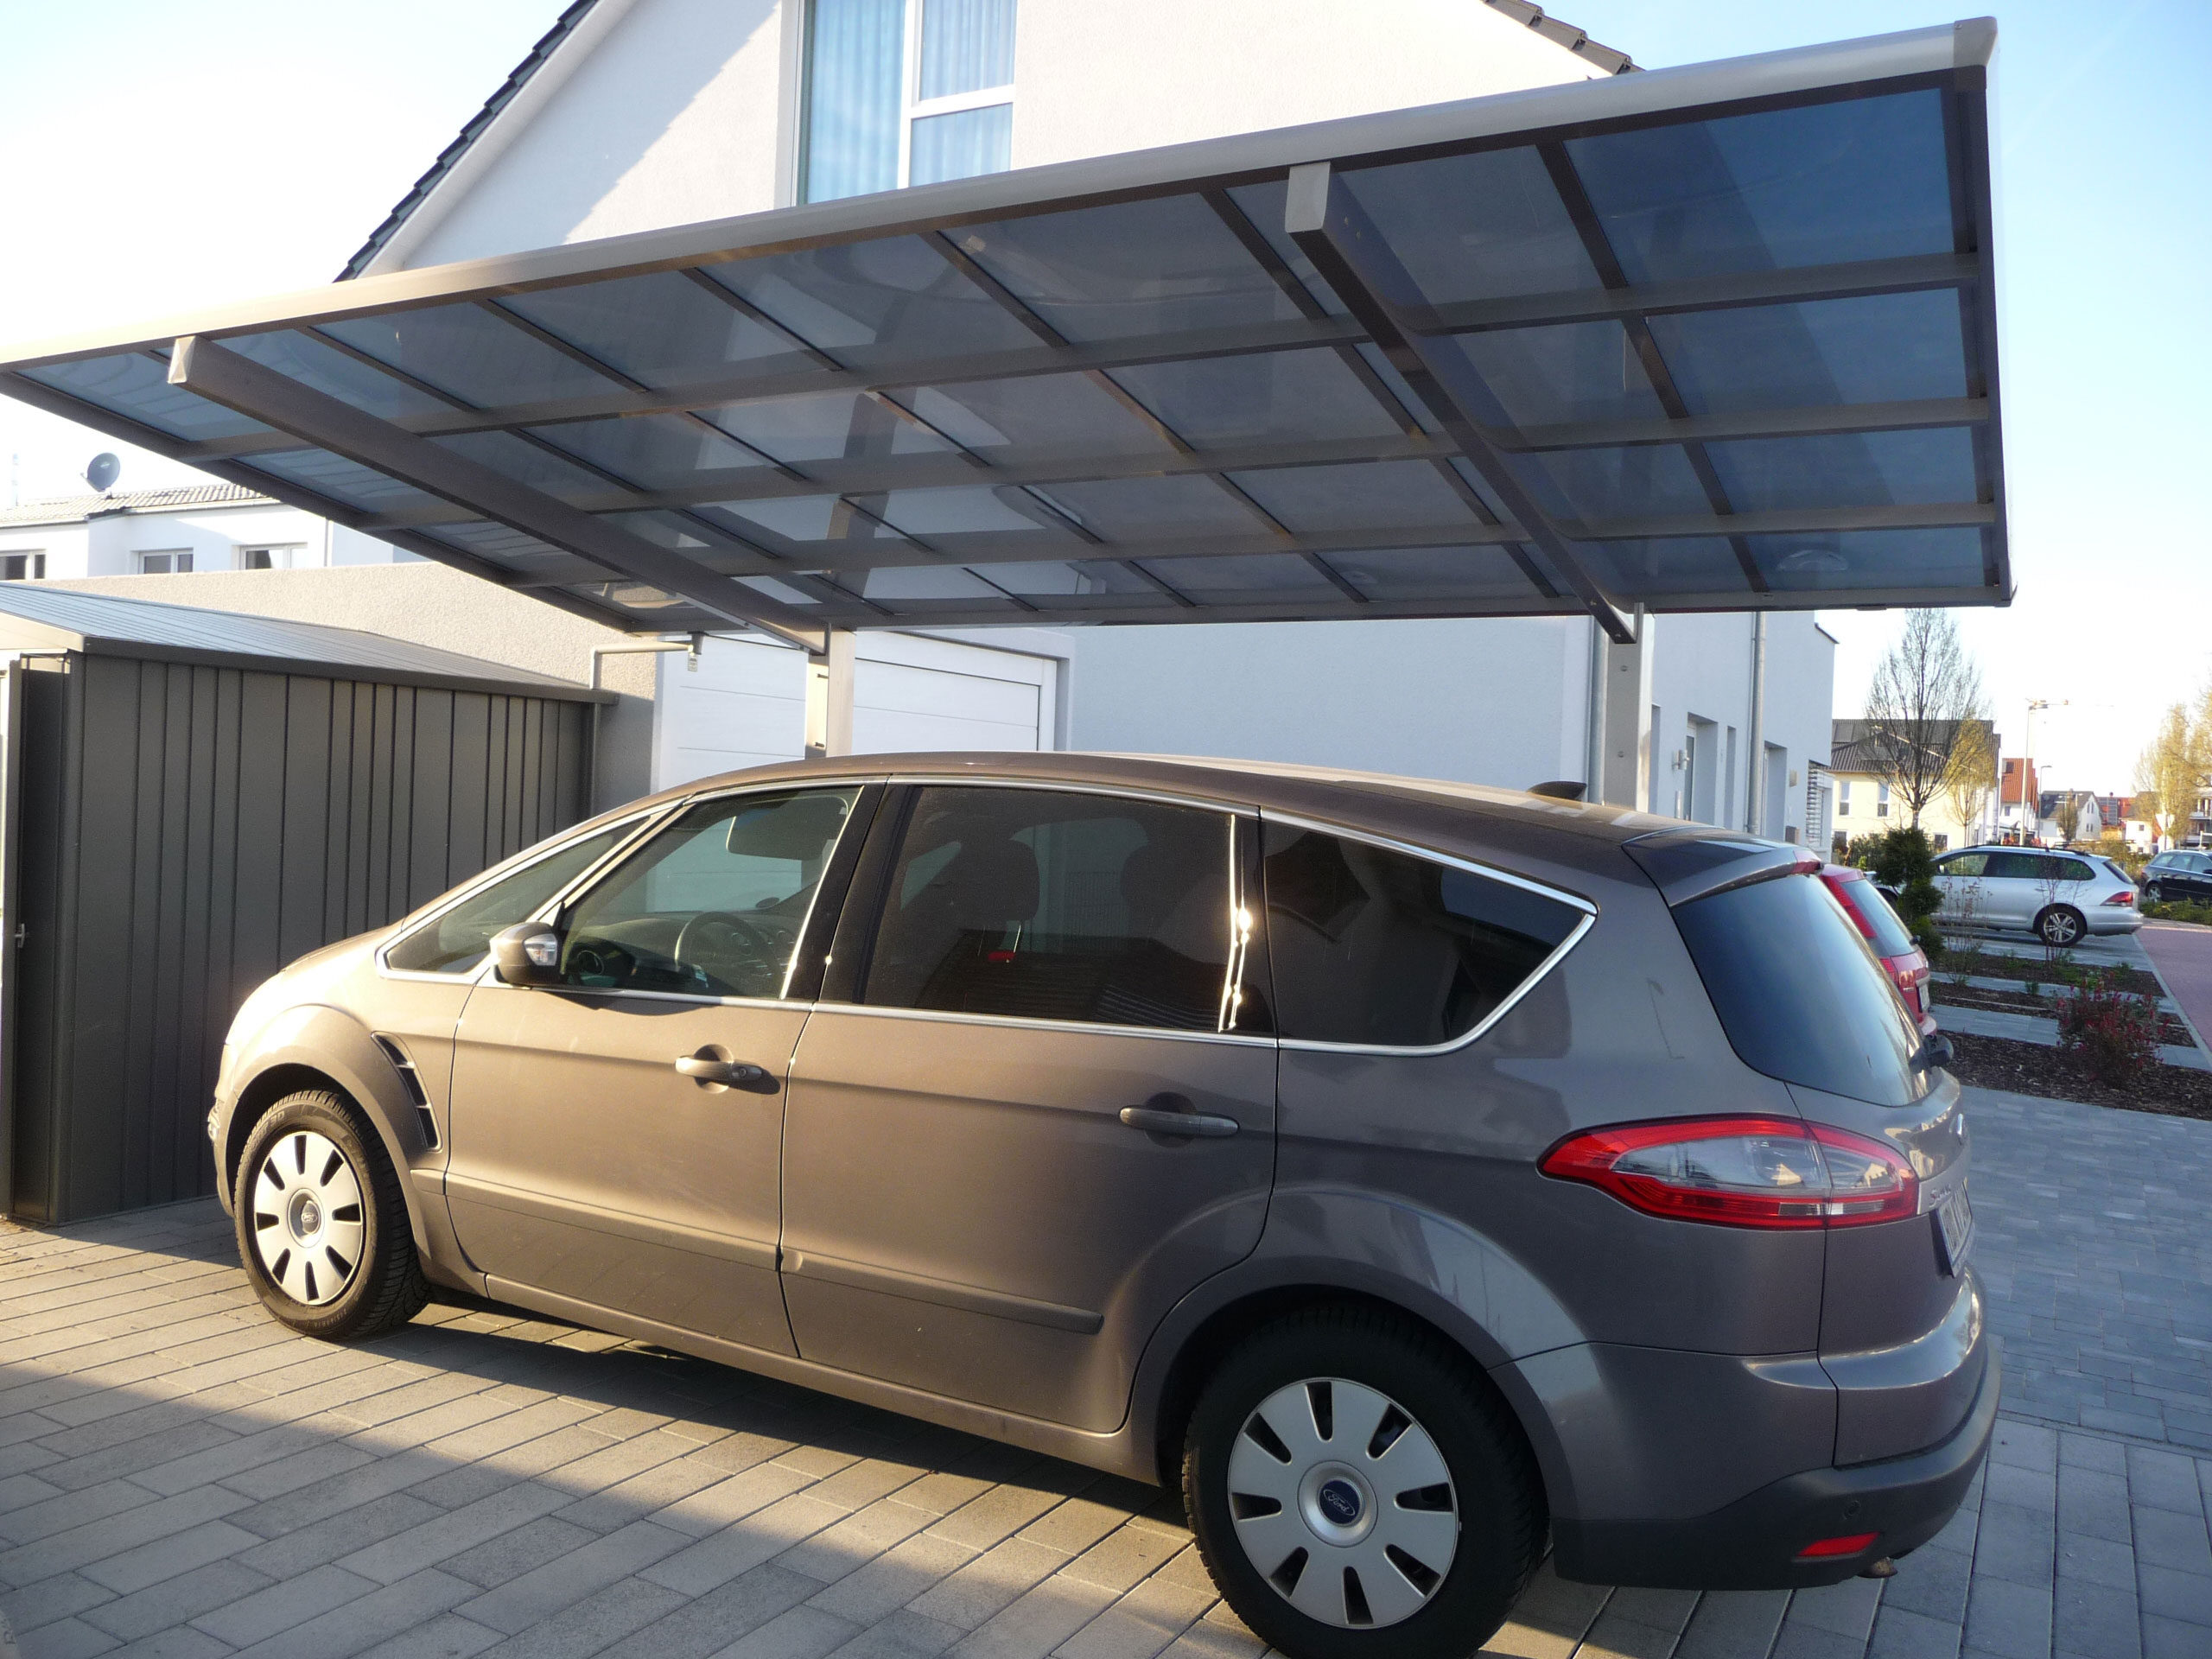 Carport XIMAX Linea Aluminium Typ 60 Standard ES 495x273x244cm Bild 3